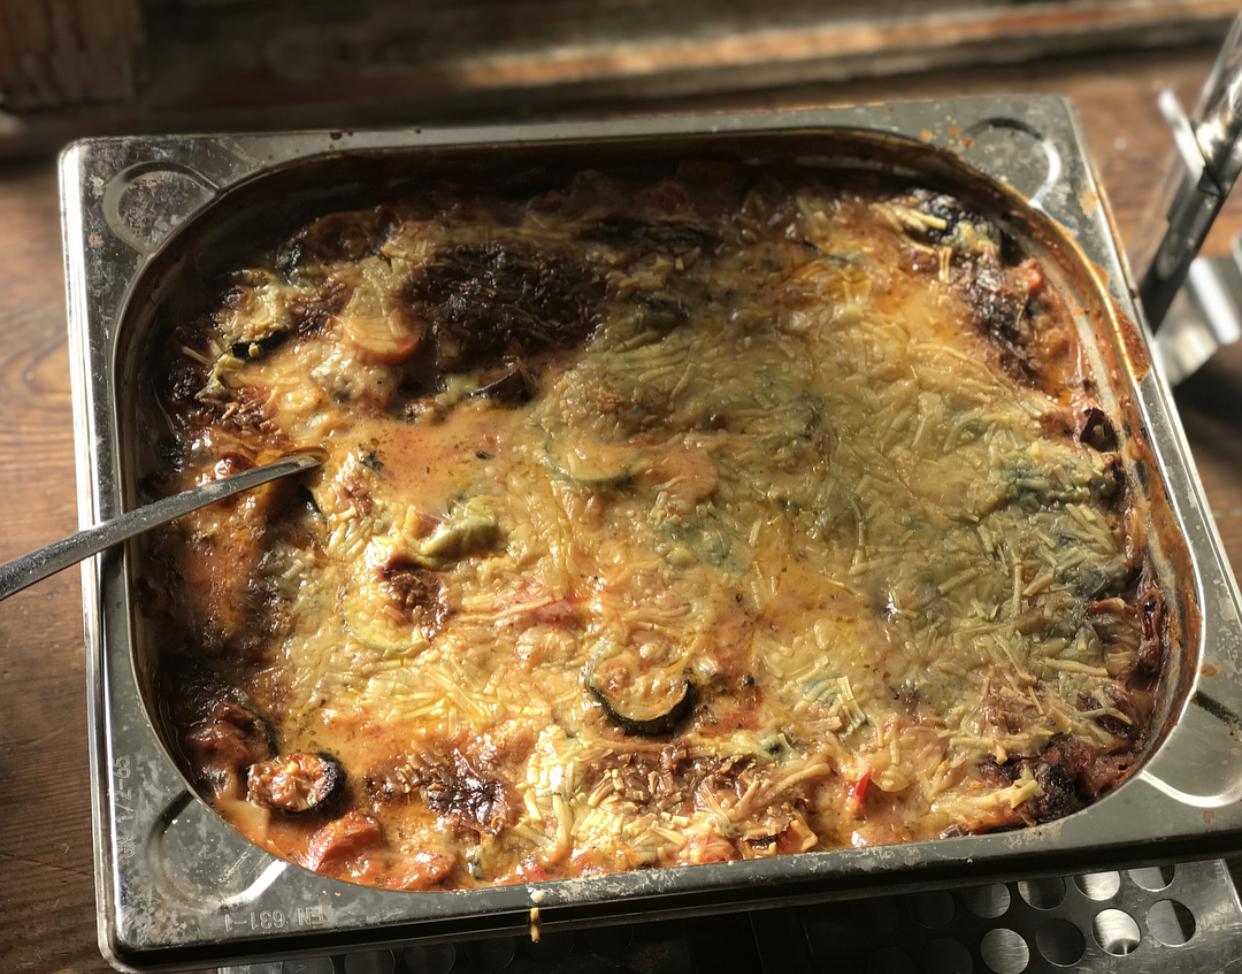 A dreamy creamy lasagna from Freundliches.